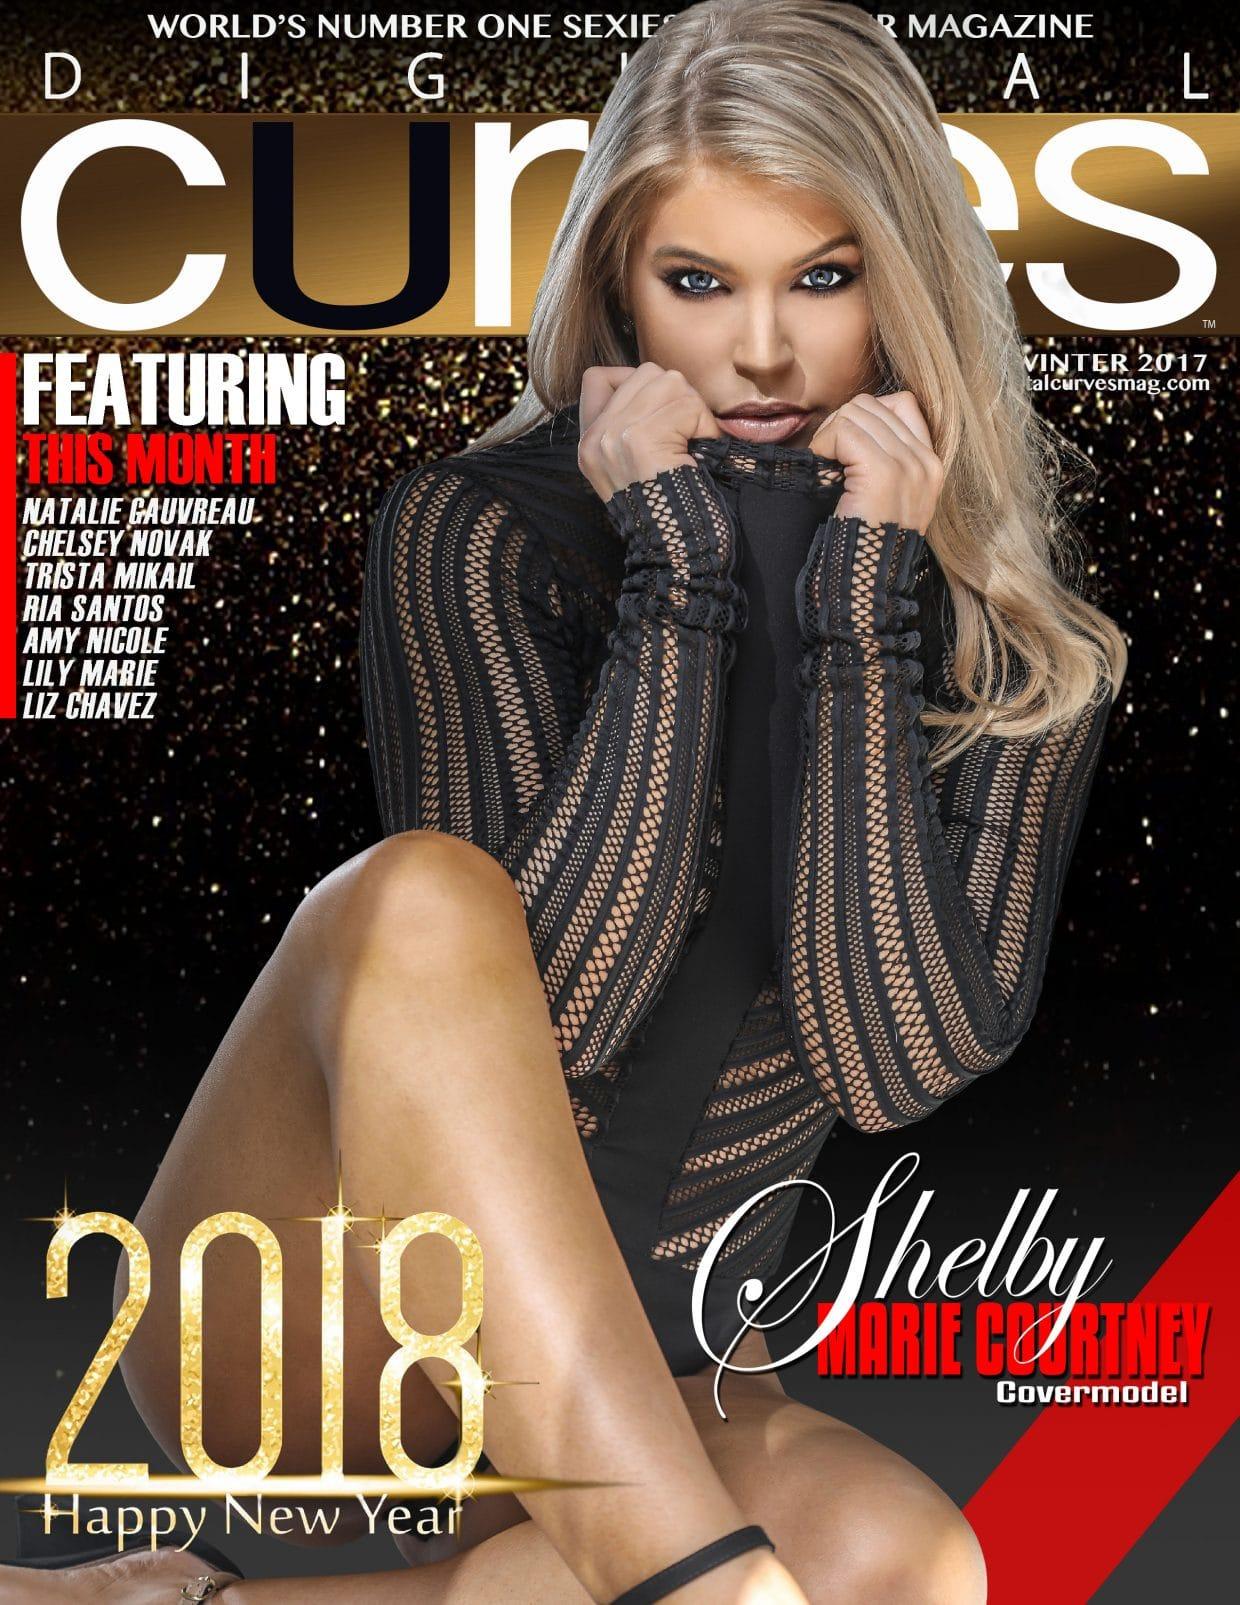 Digital Curves Magazine - Winter Issue - 2018 1